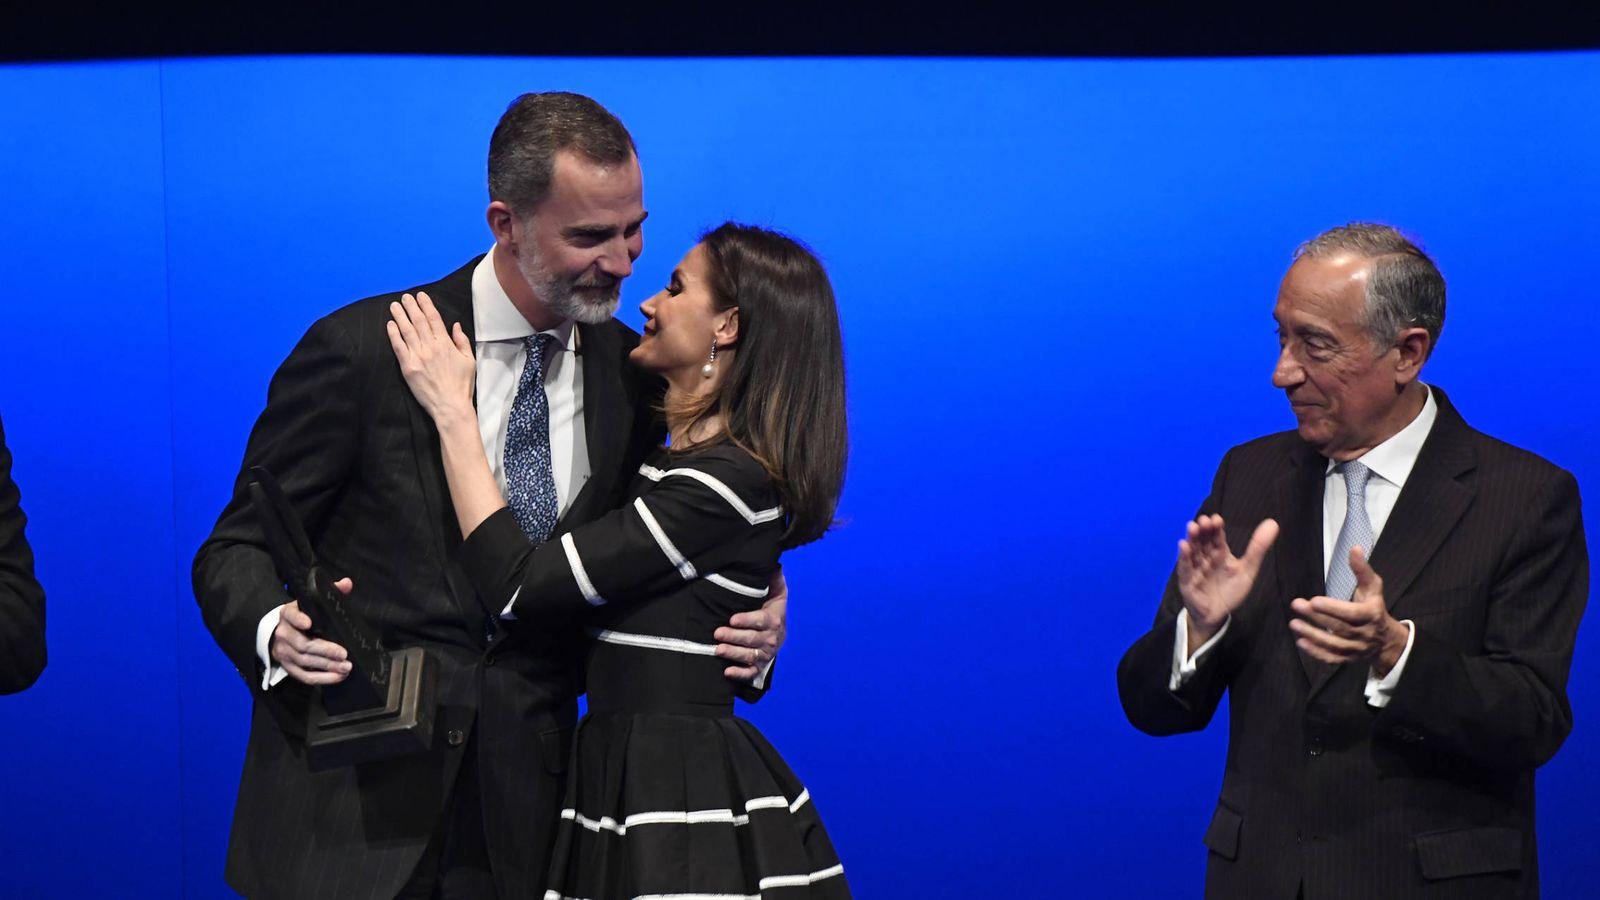 Foto: La Reina felicitando a don Felipe. (Limited Pictures)